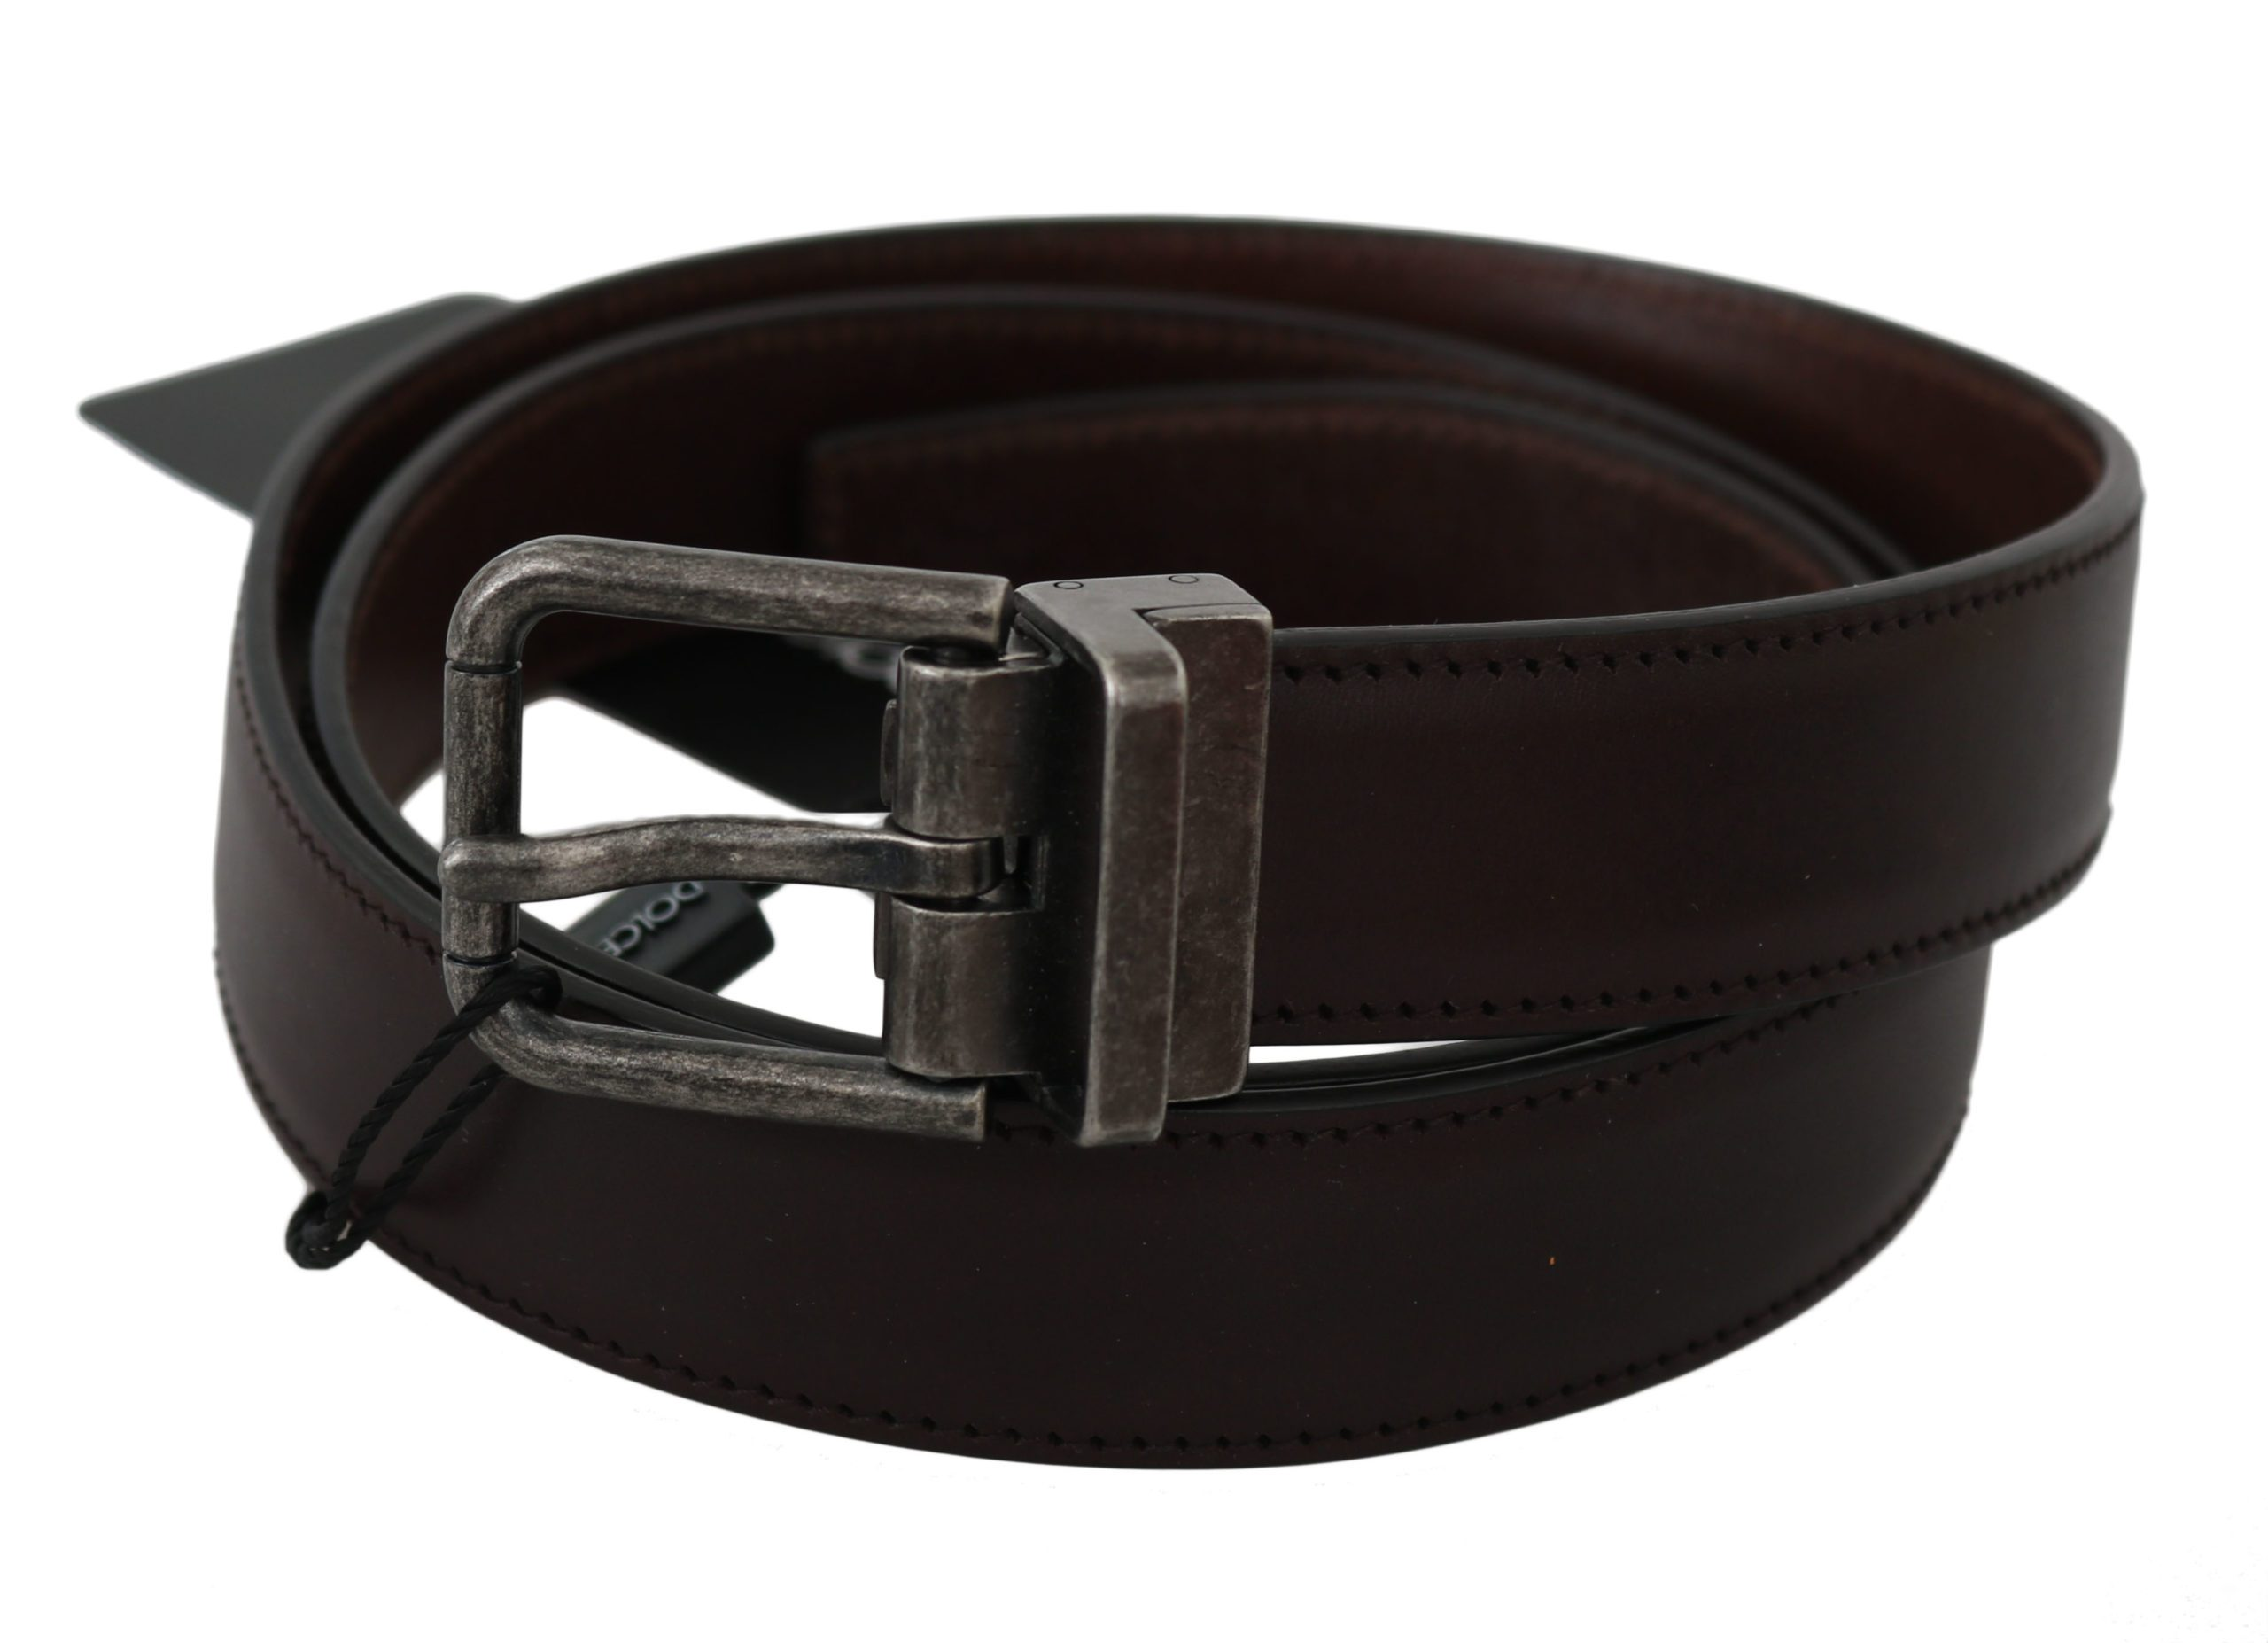 Dolce & Gabbana Men's Belt Brown BEL60336 - 100 cm / 40 Inches